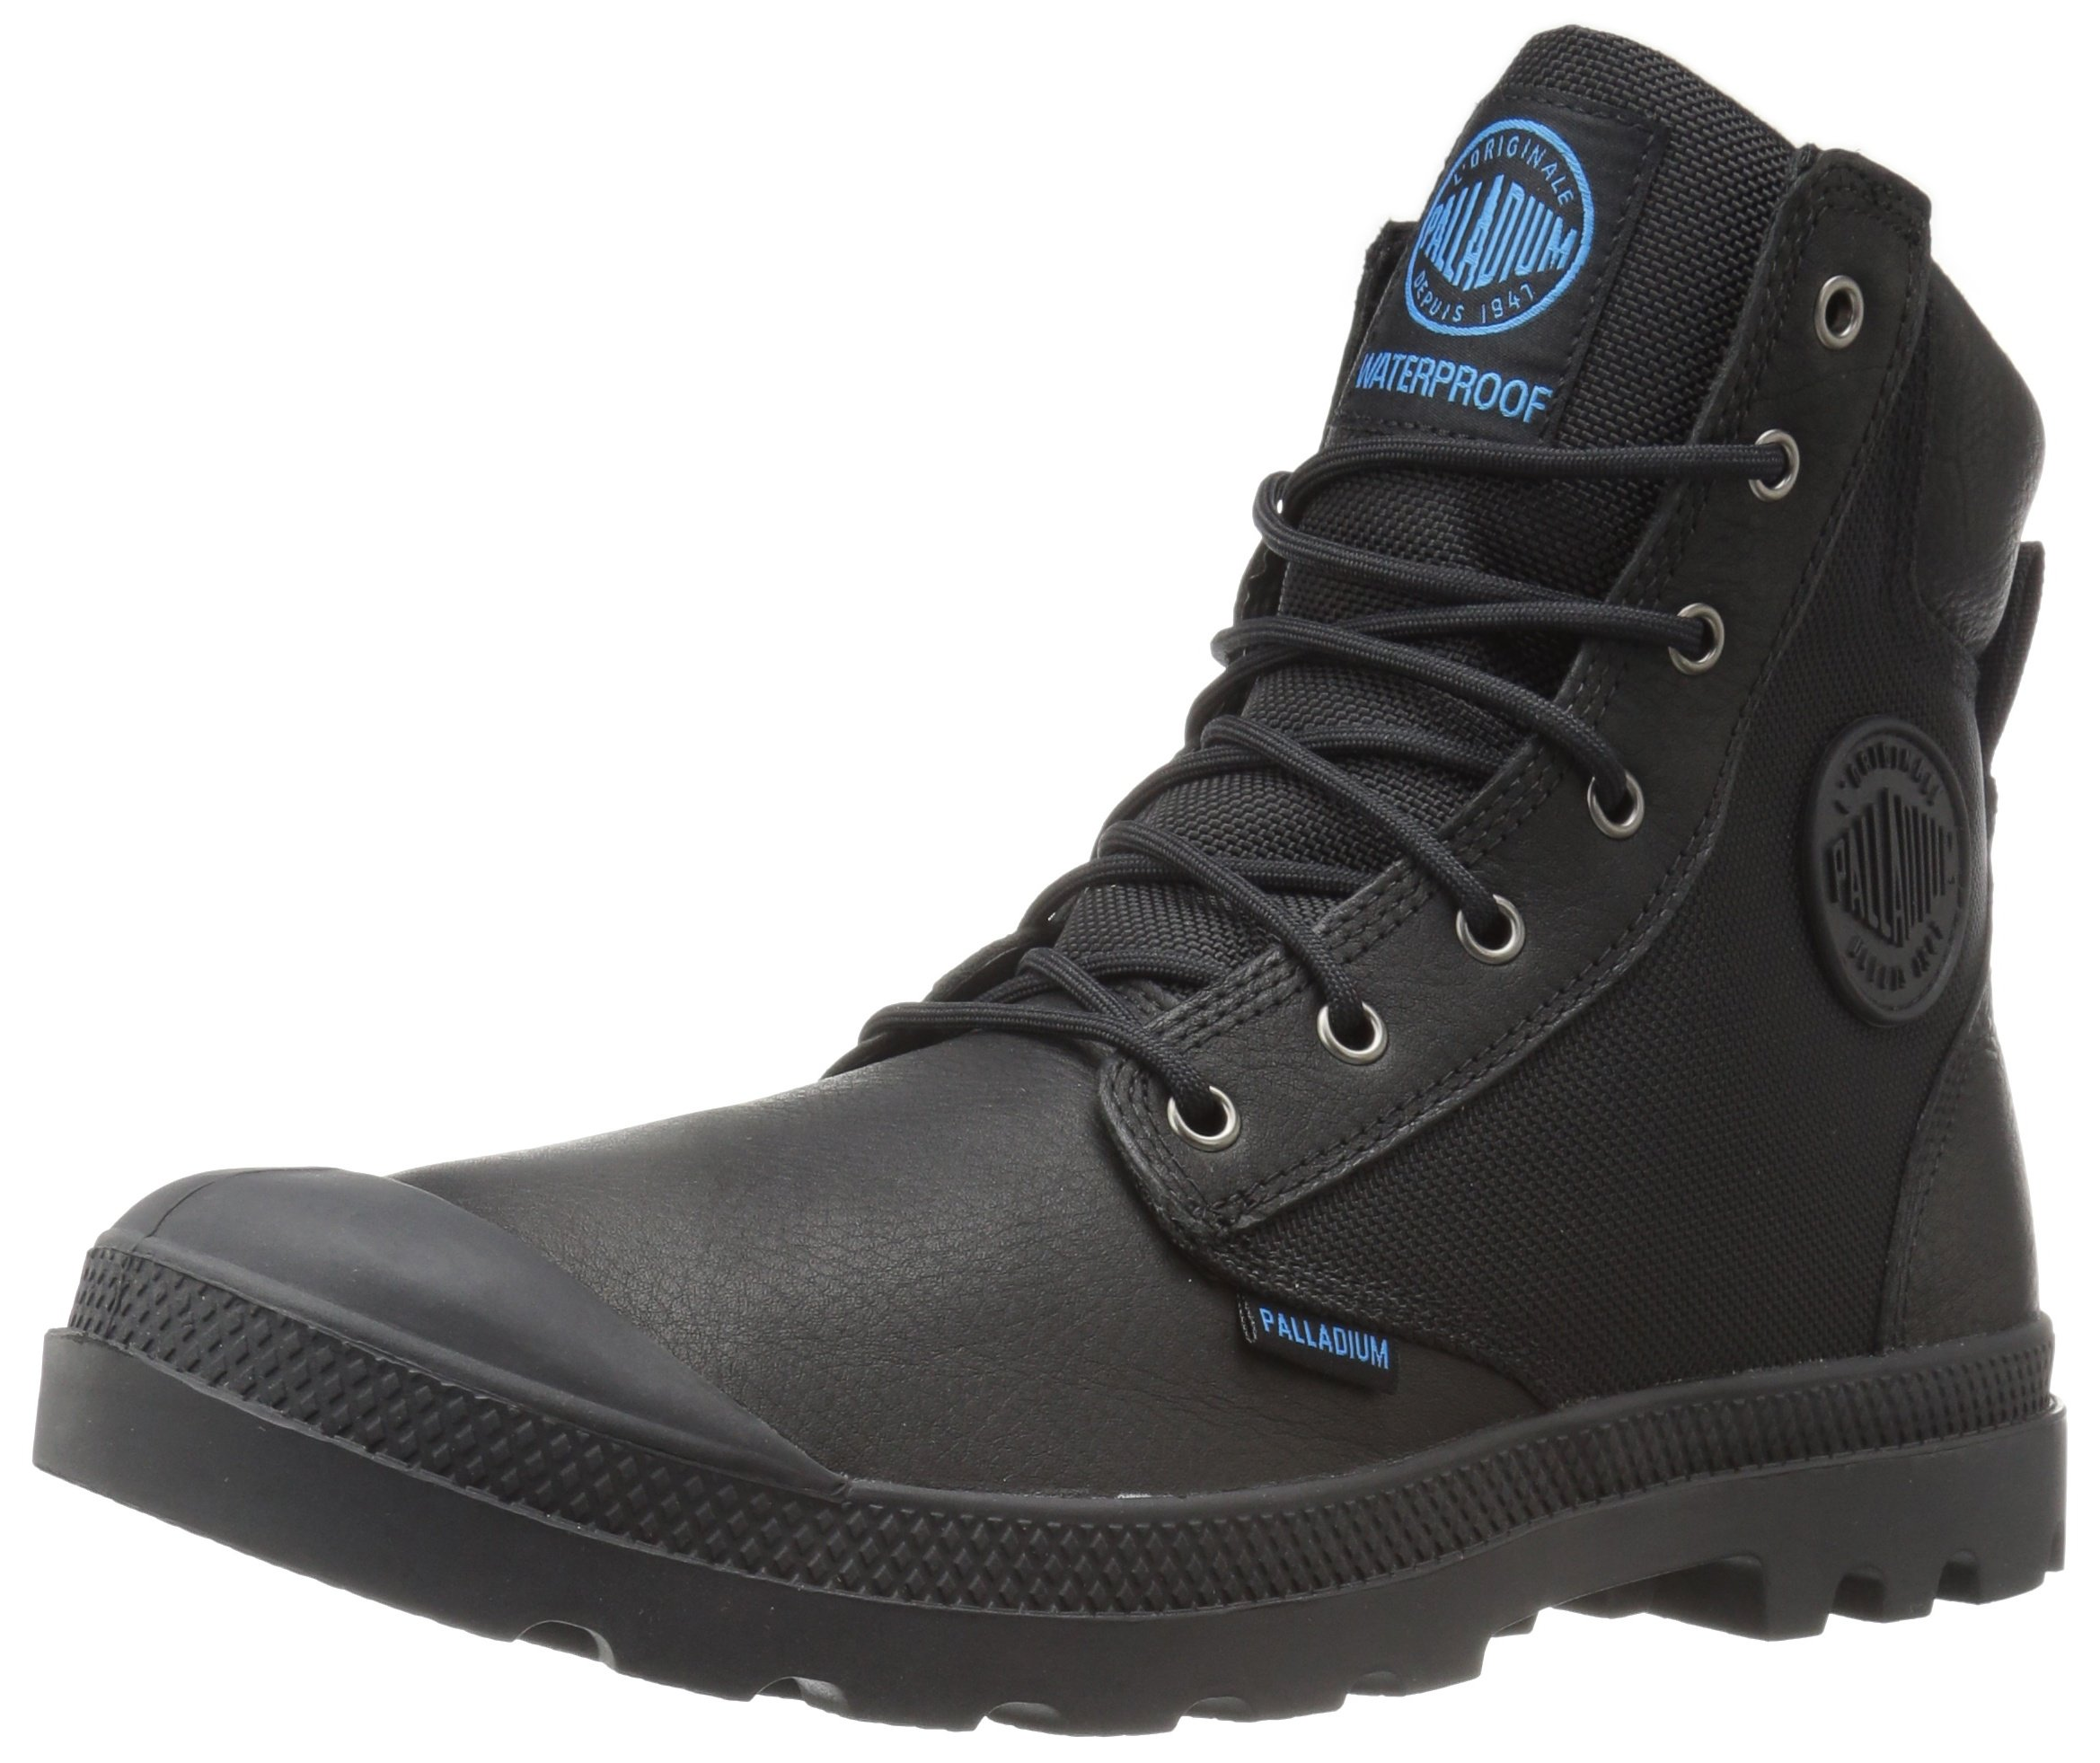 Palladium Men's Pampa Sport Cuff Wpn Rain Boot, Black, 11 M US by Palladium